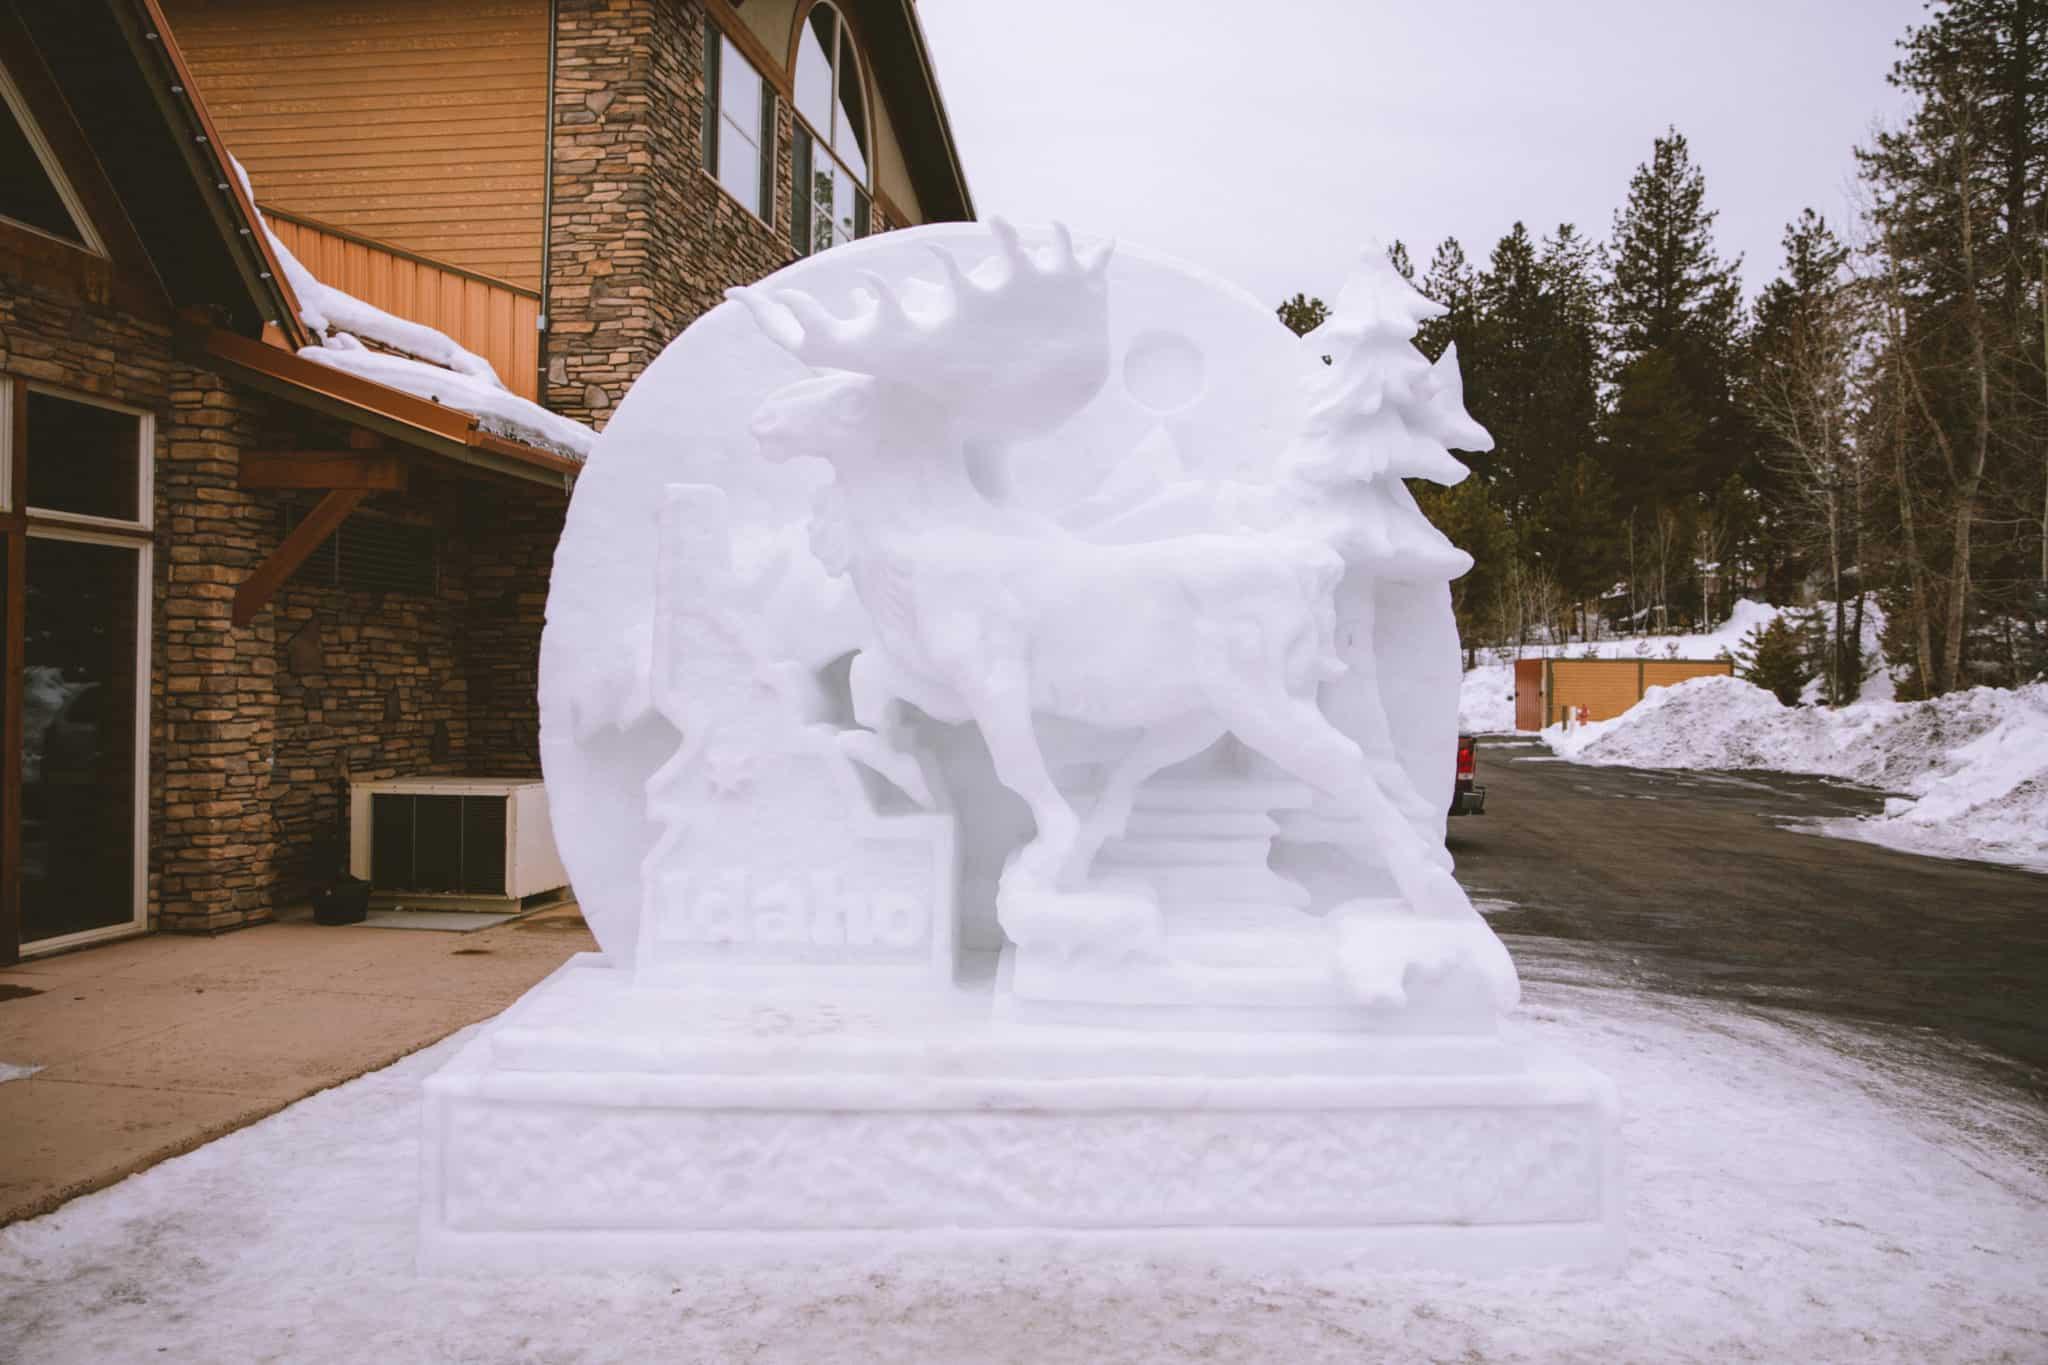 Ice Sculptures - The Mandagies Visit McCall Post